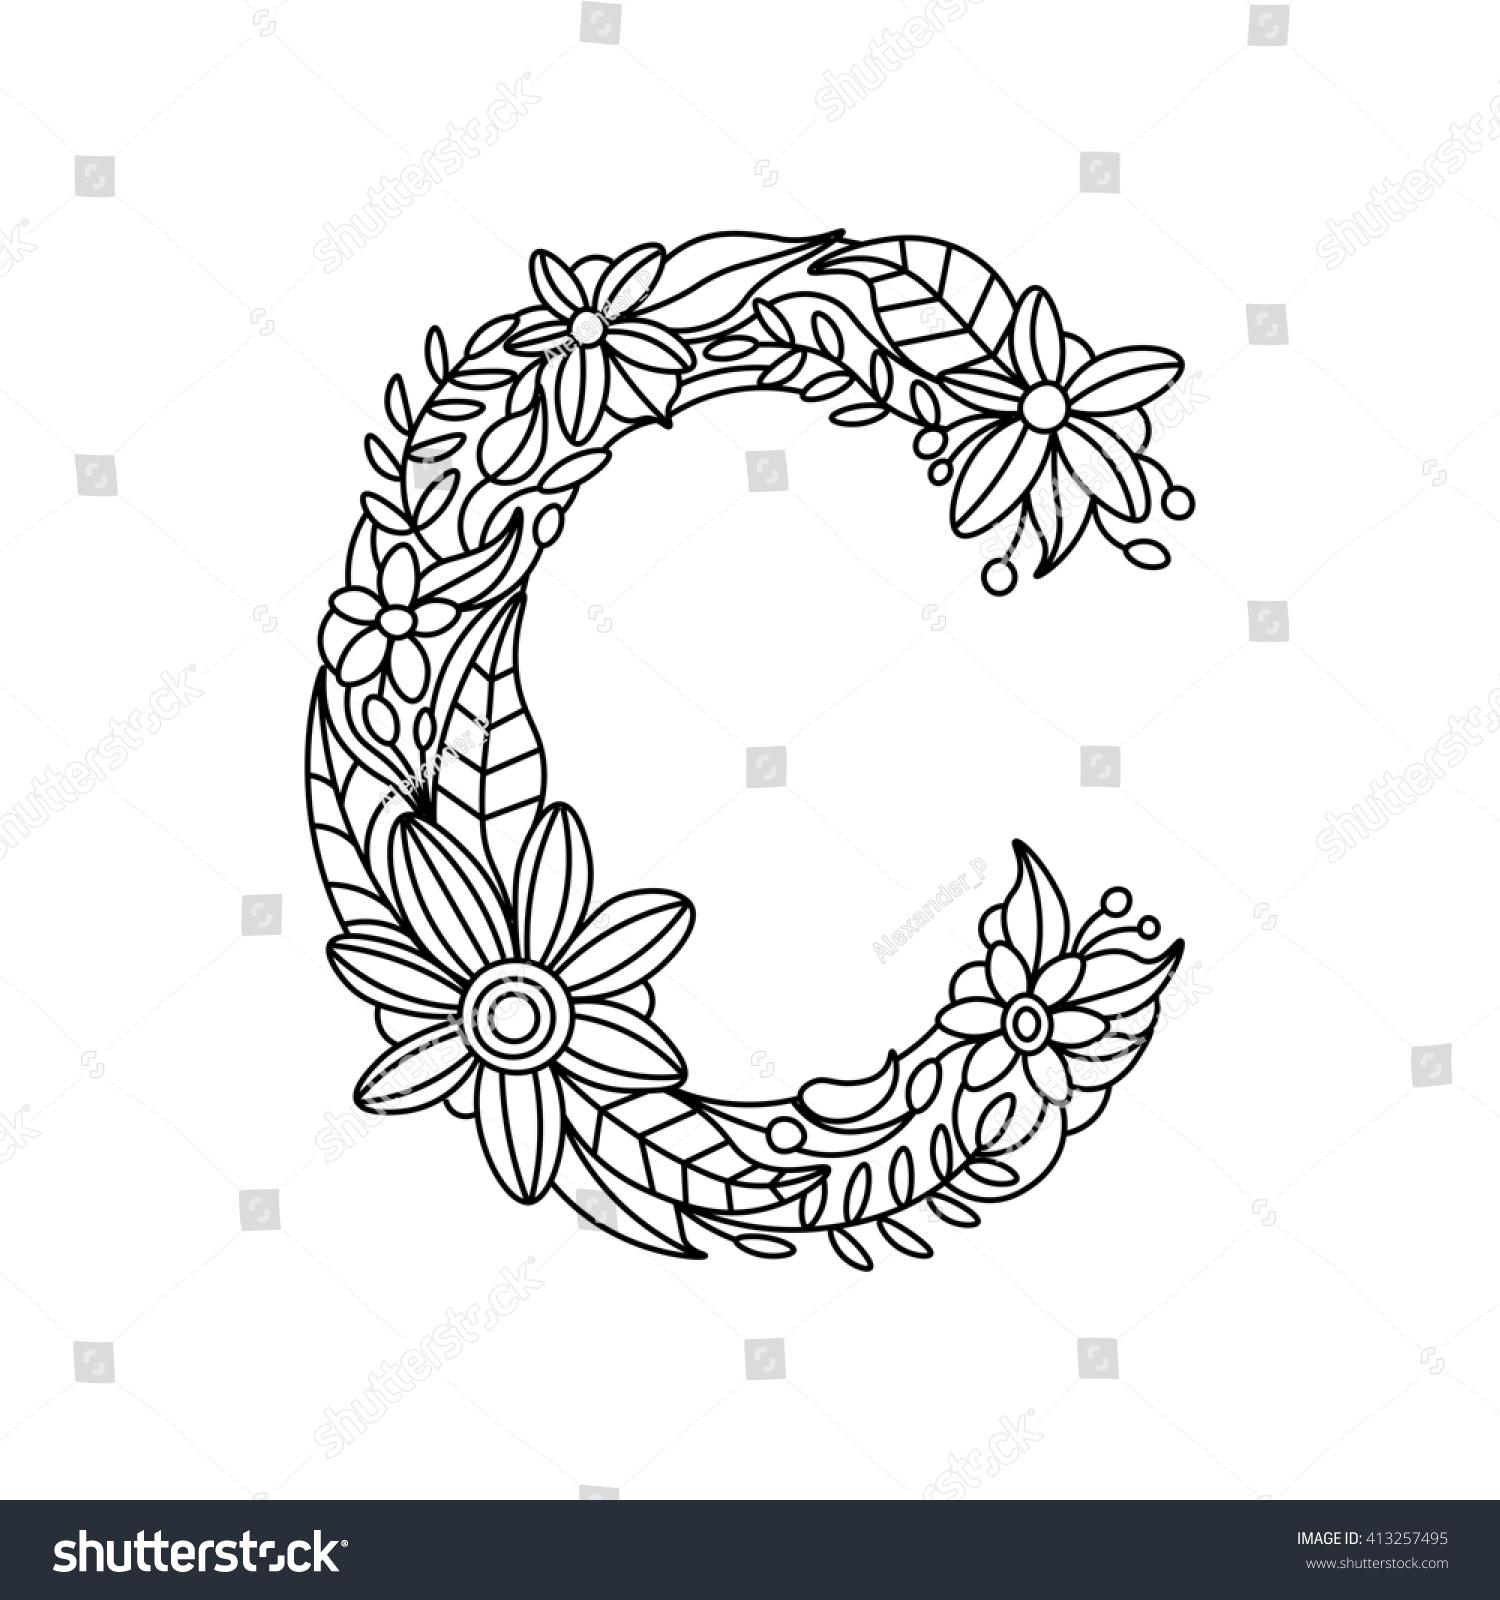 Floral Font Number Coloring Book For Adults Raster Illustration